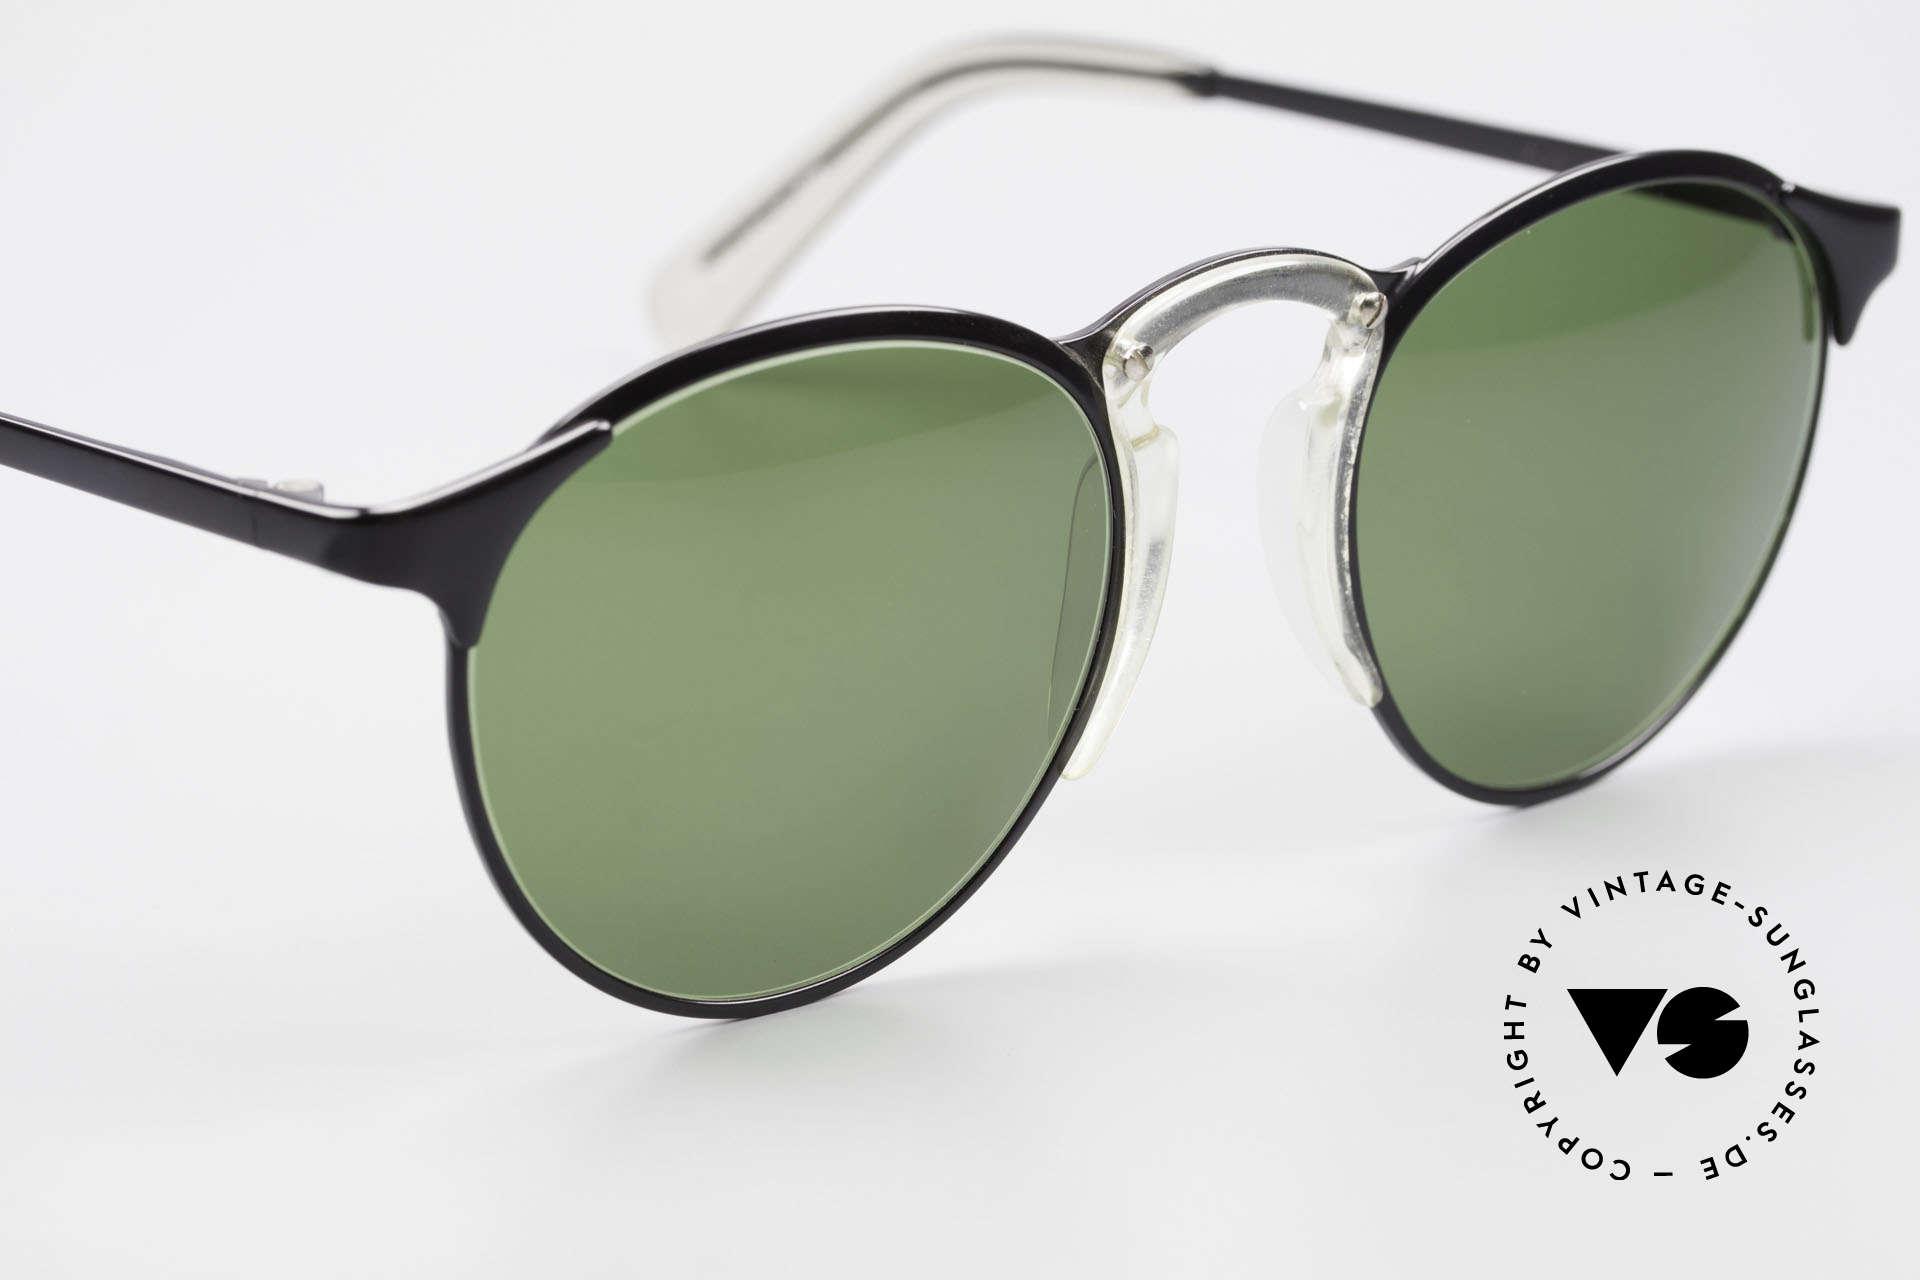 Jean Paul Gaultier 57-0174 Rare 90's JPG Panto Sunglasses, NO RETRO sunglasses, but an old original from 1997, Made for Men and Women